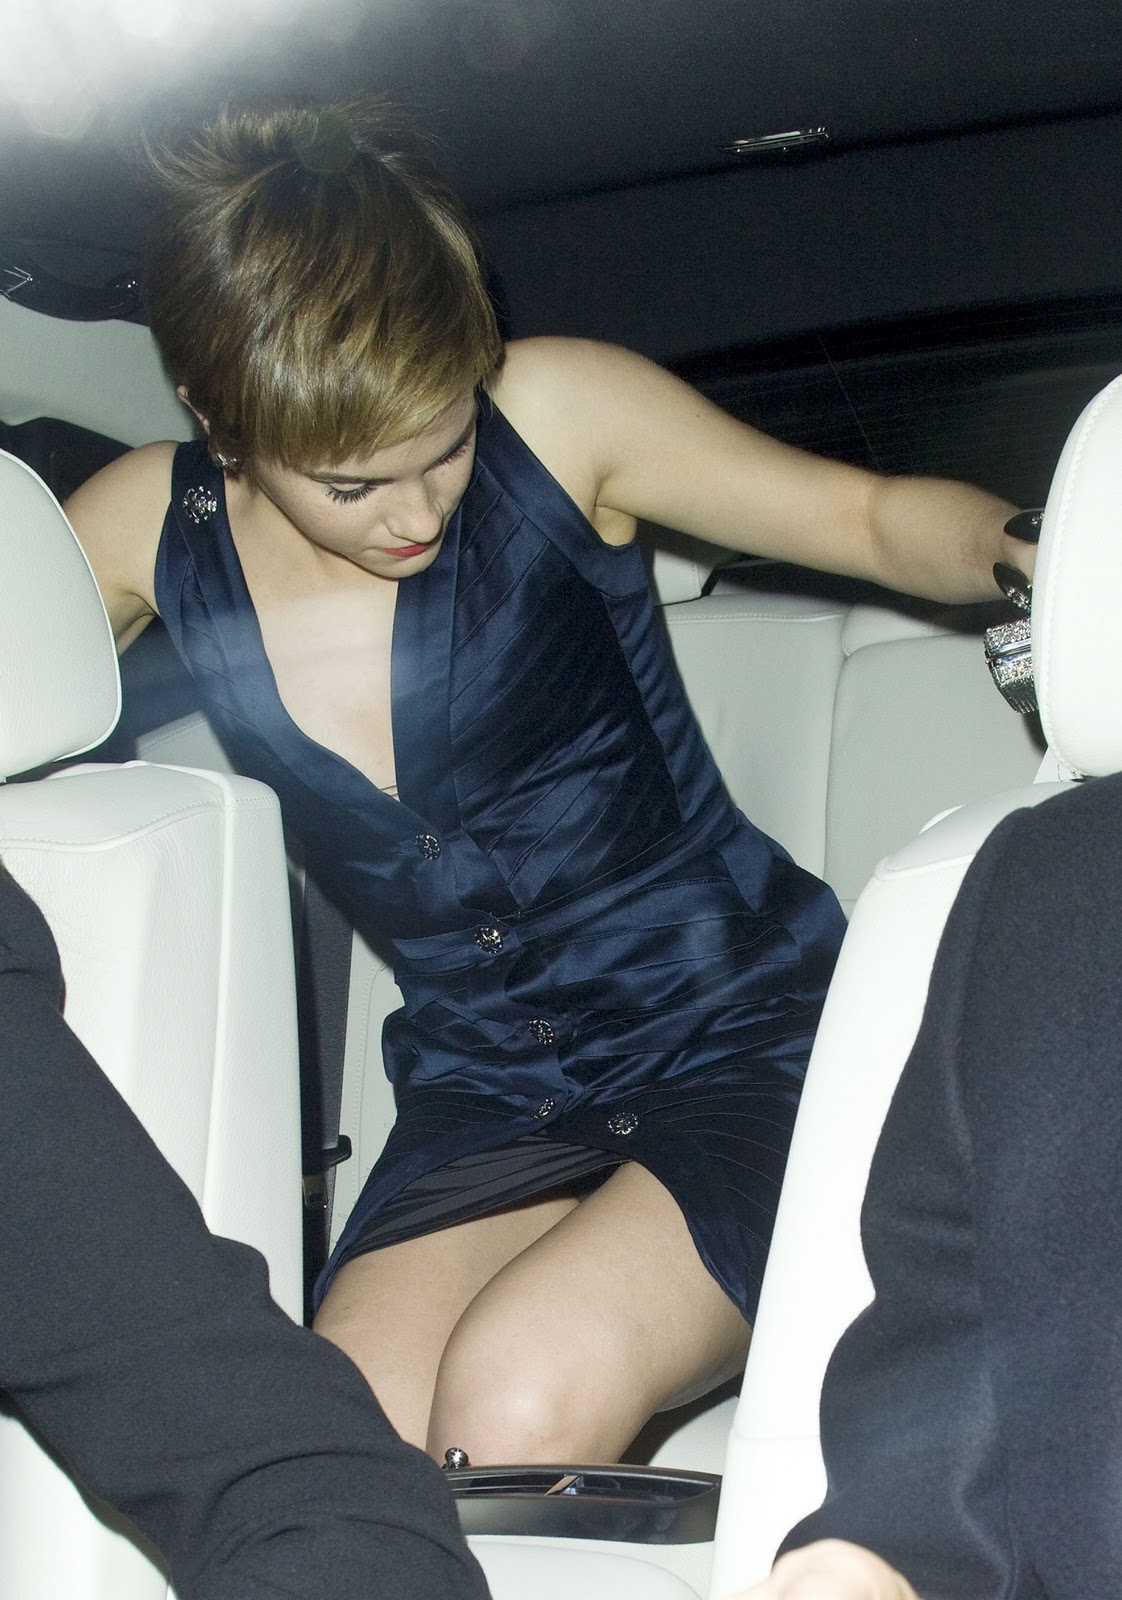 Emma Watson Panty Upskirt And Nipple Slip Candids At Pre ... Rupert Grint Bio